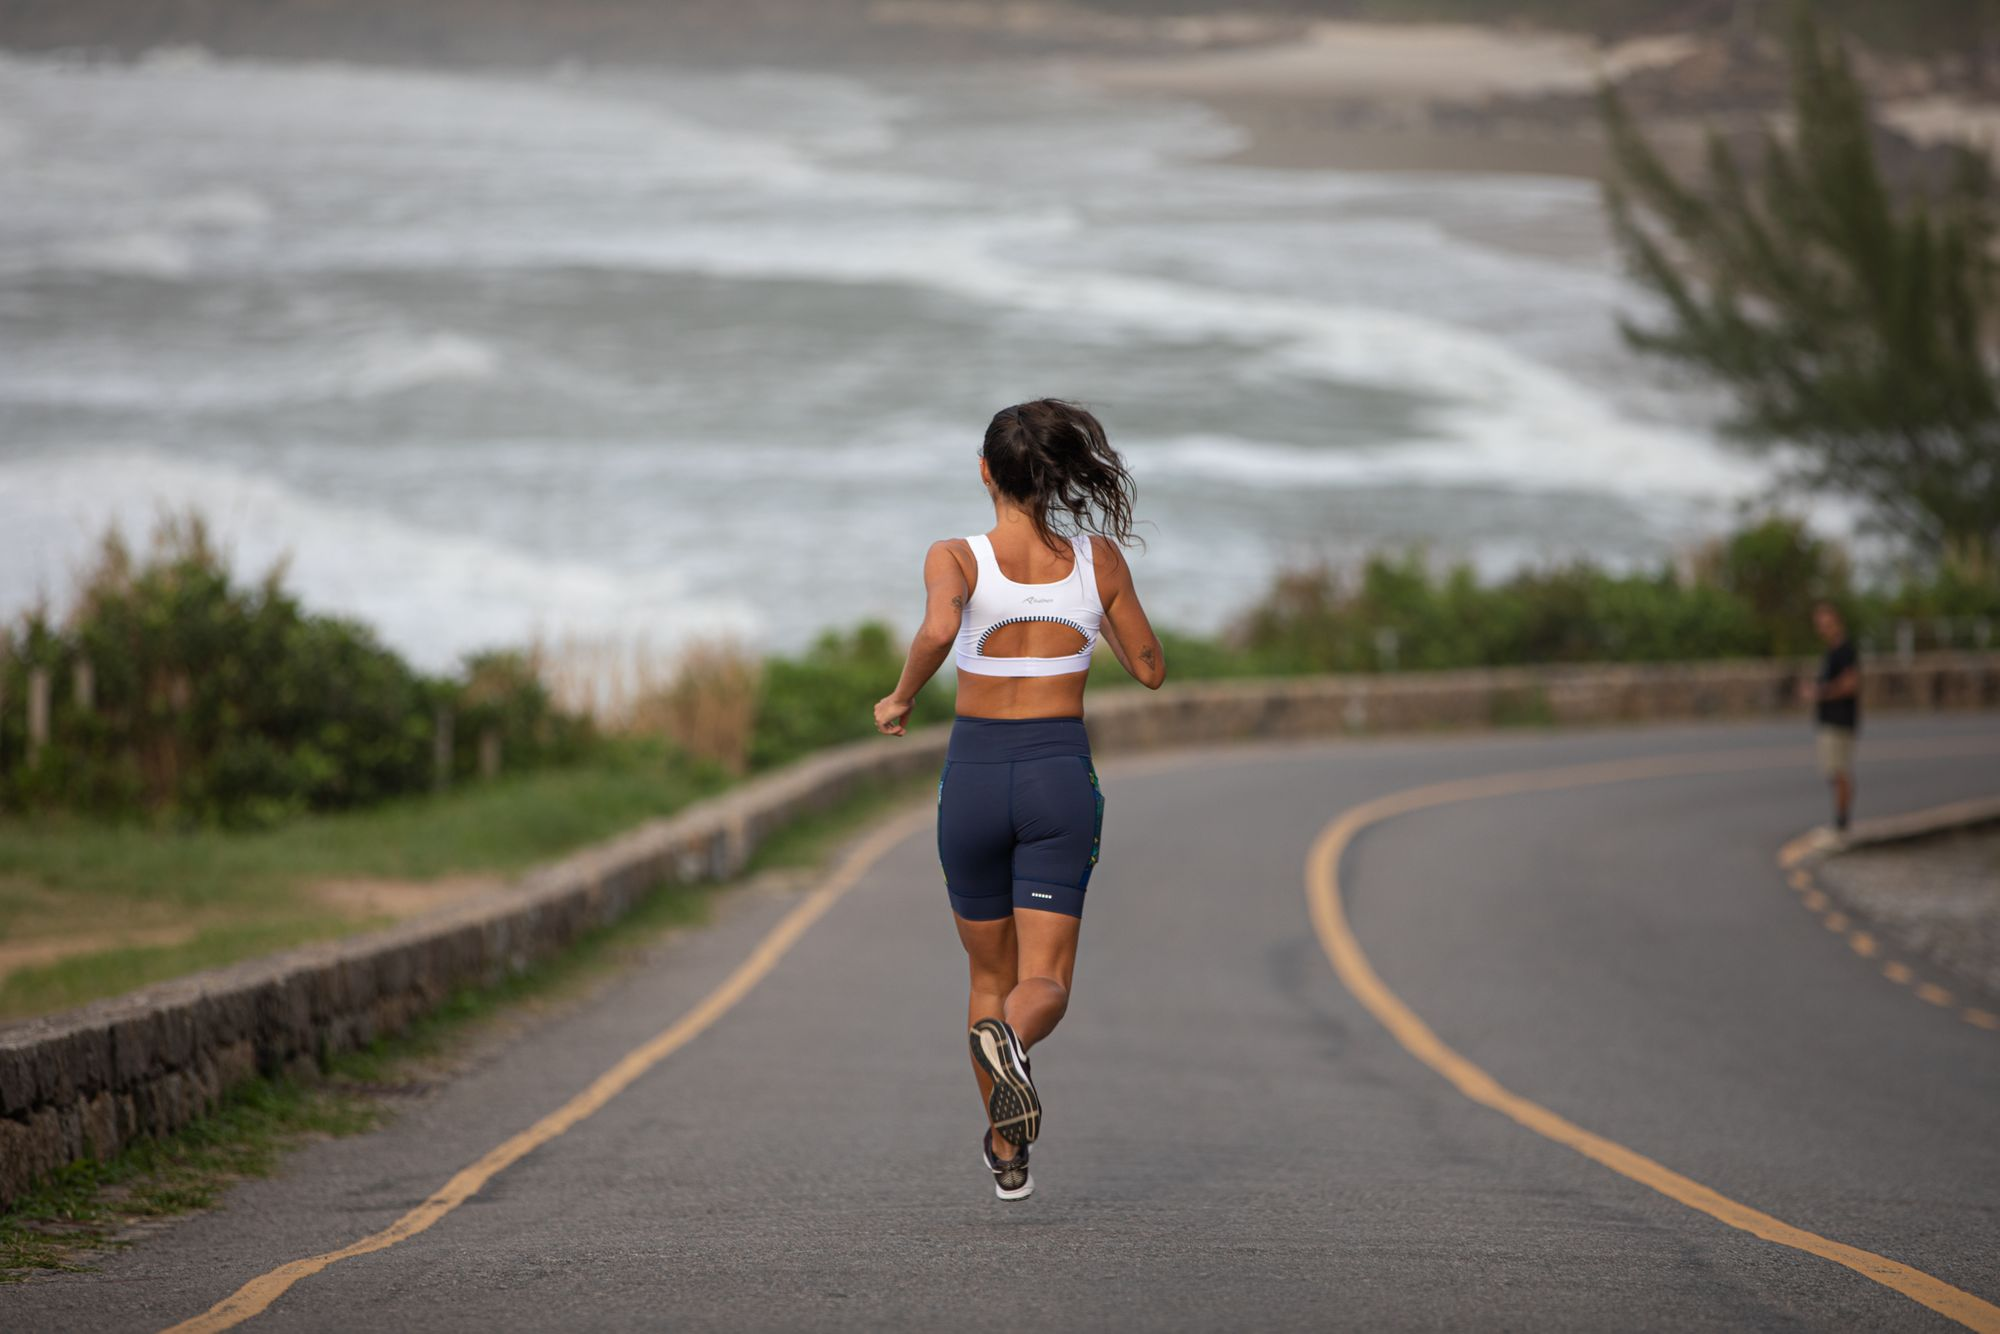 Authen reúne mães esportistas para treinos on-line